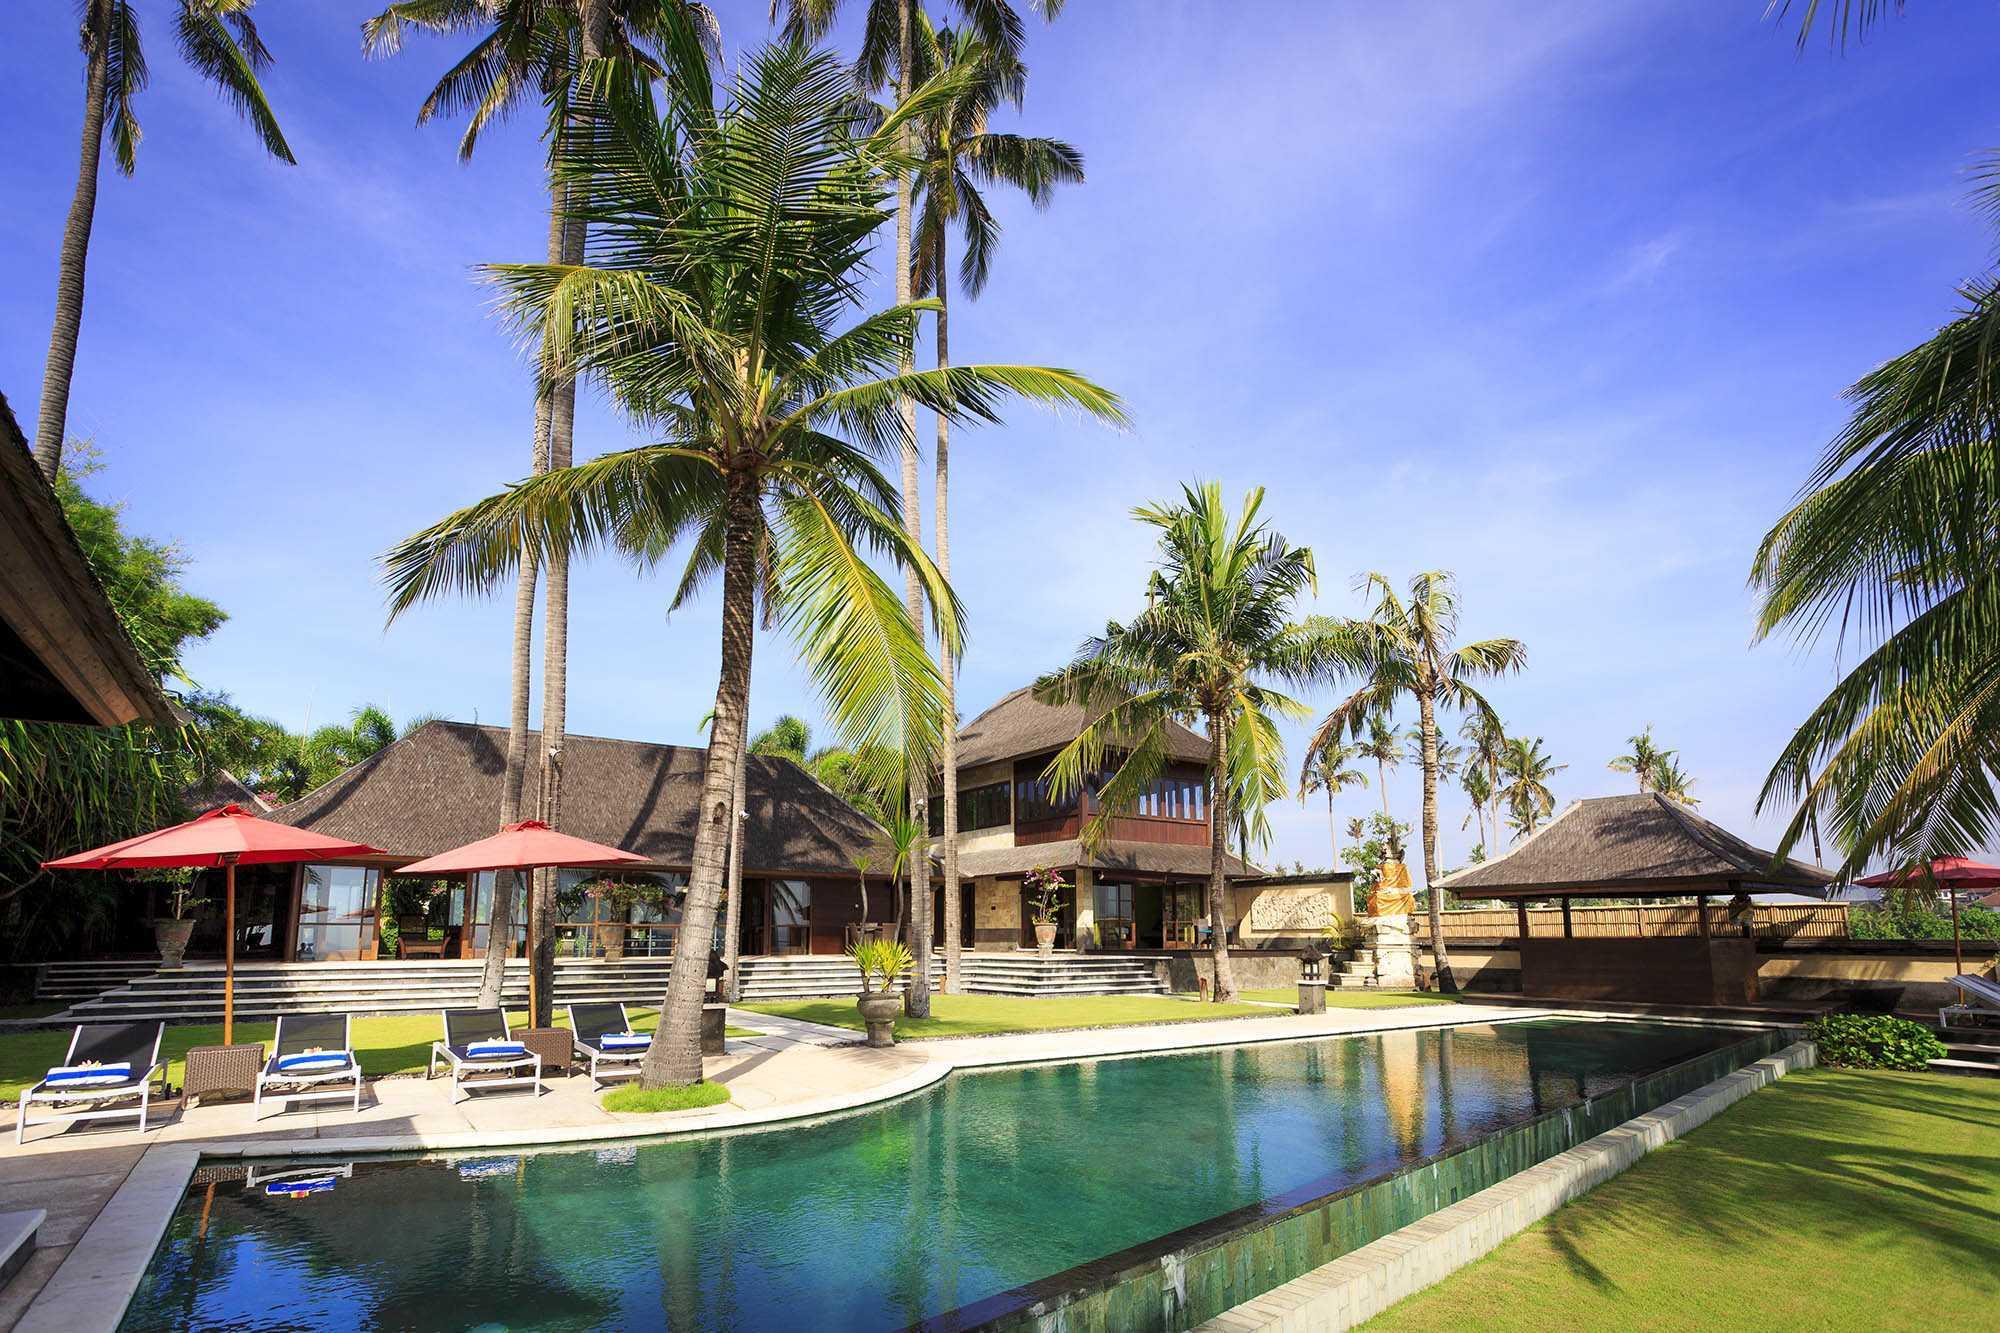 Agung Budi Raharsa   Architecture & Engineering Pushpapuri Villa - Bali Bali, Indonesia Bali, Indonesia Agung-Budi-Raharsa-Pushpapuri-Villa  88355